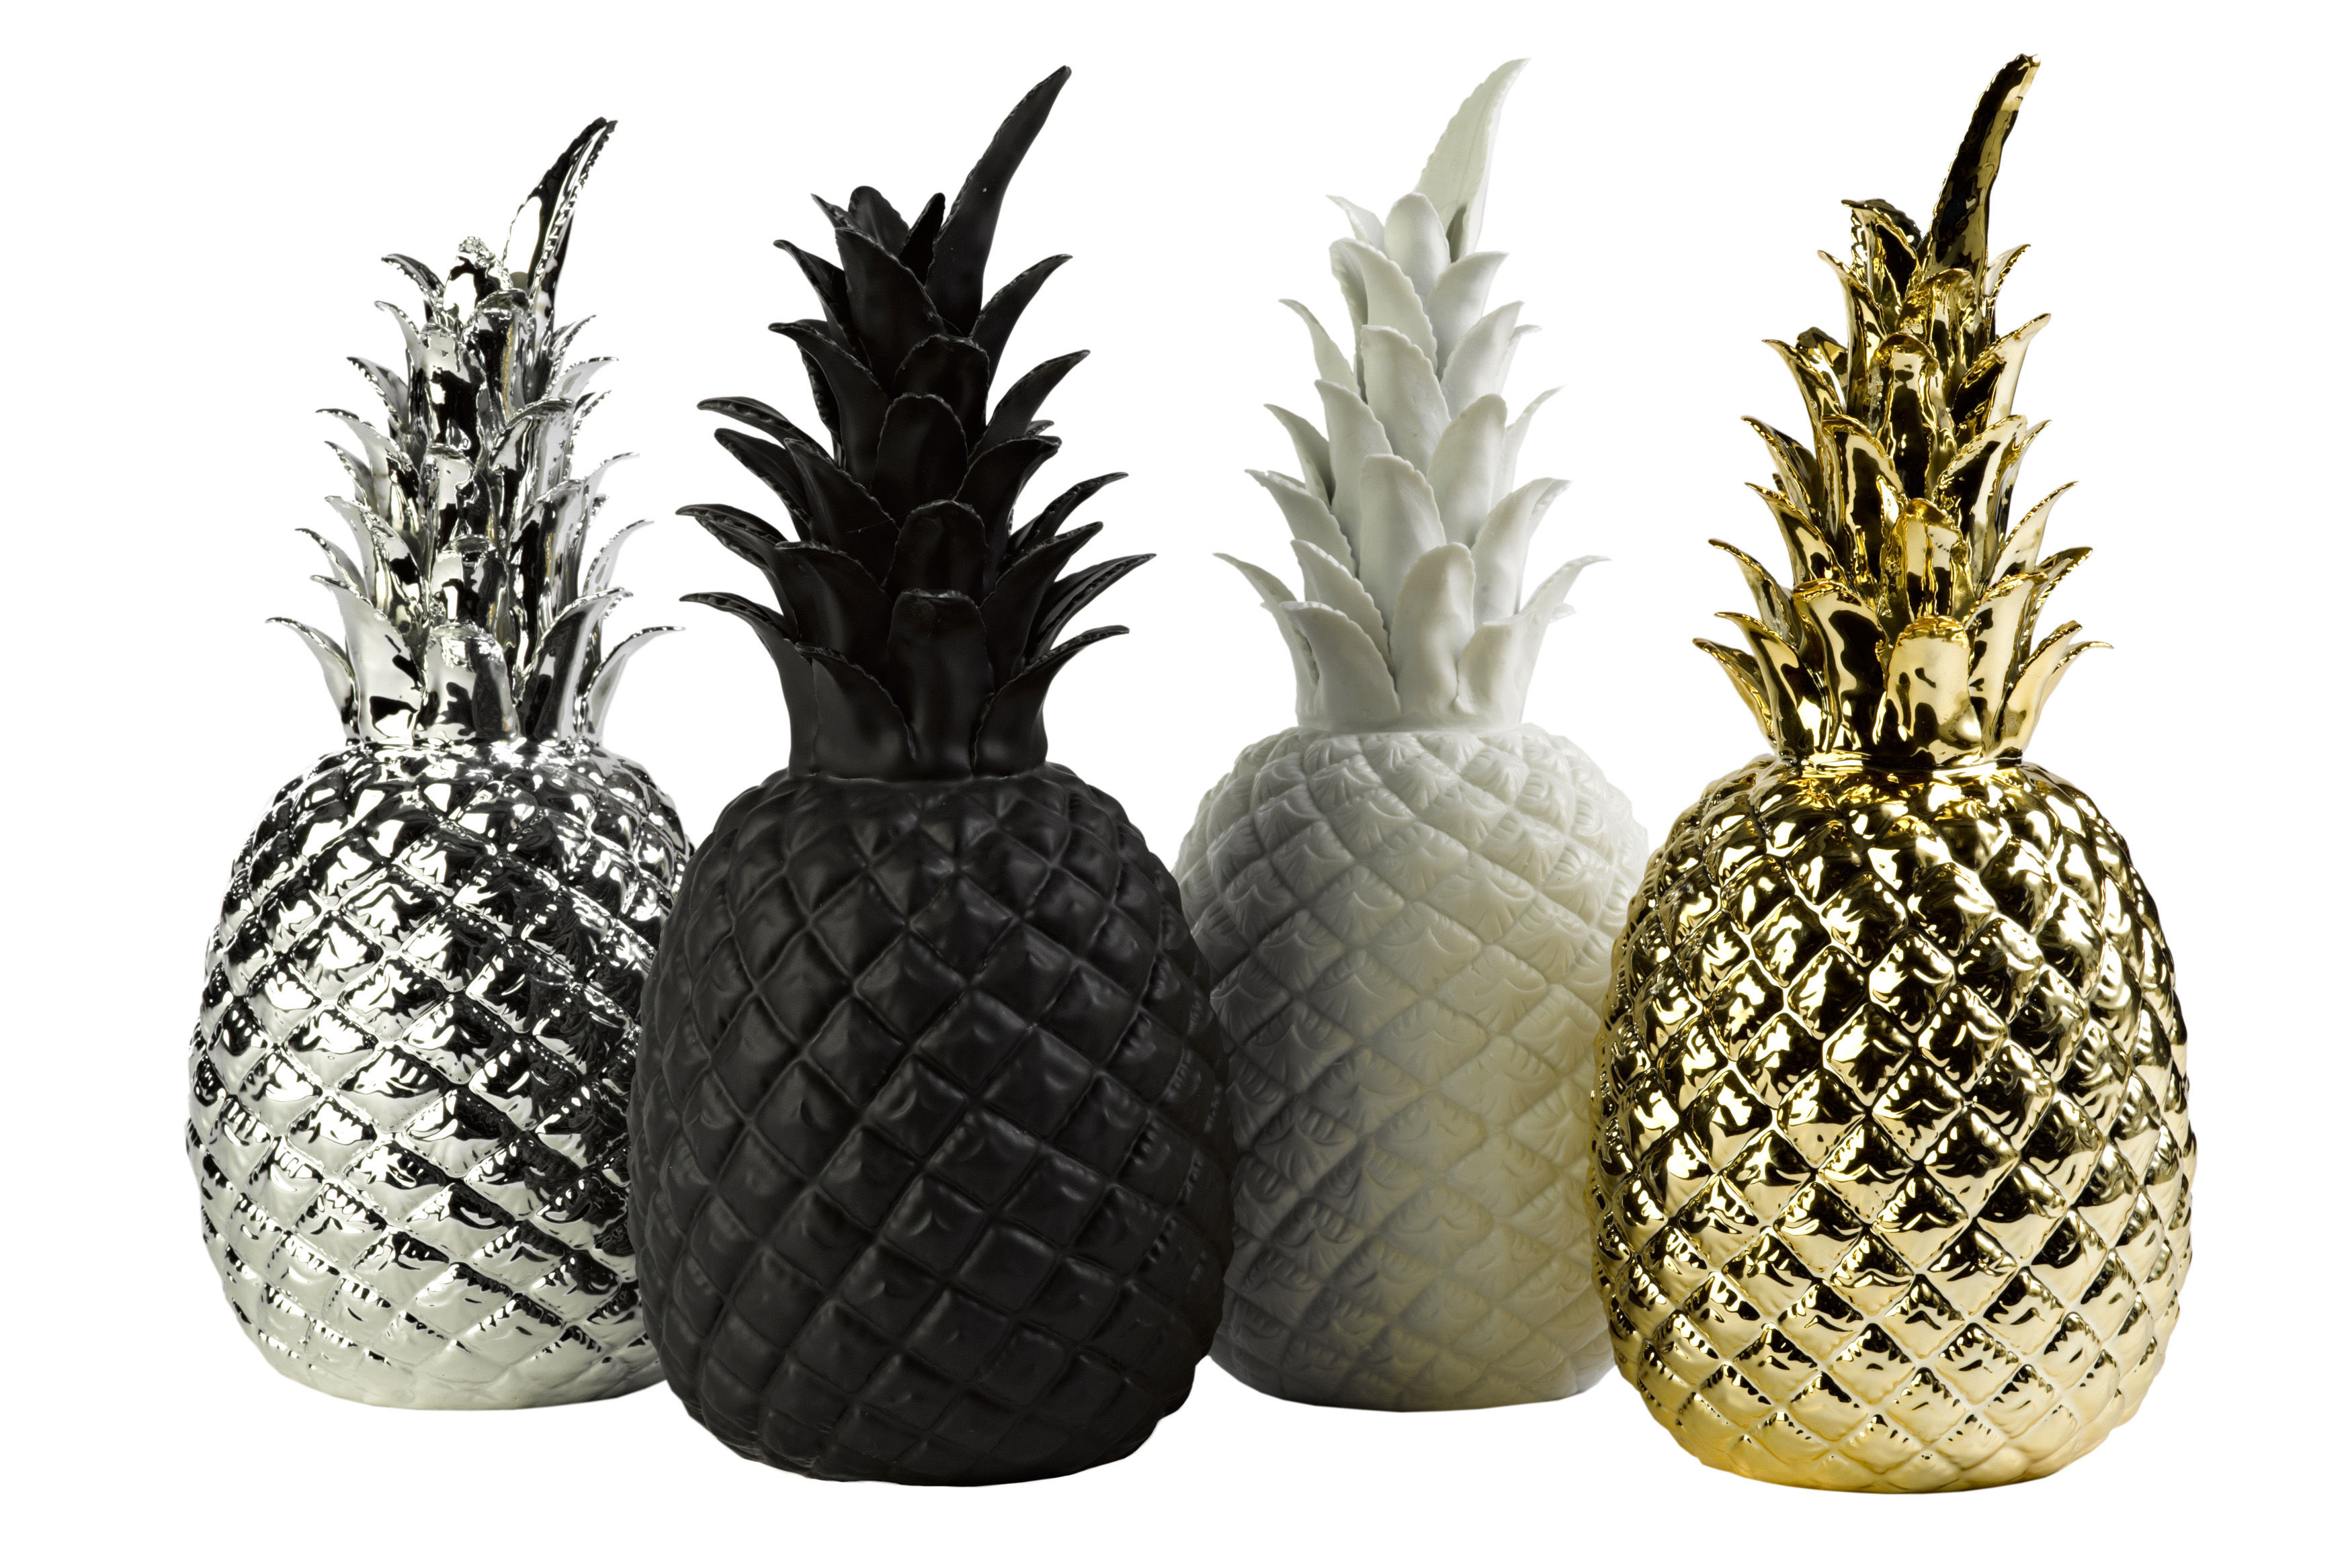 d coration pineapple small 14 x h 32 cm porcelaine noir pols potten made in design. Black Bedroom Furniture Sets. Home Design Ideas